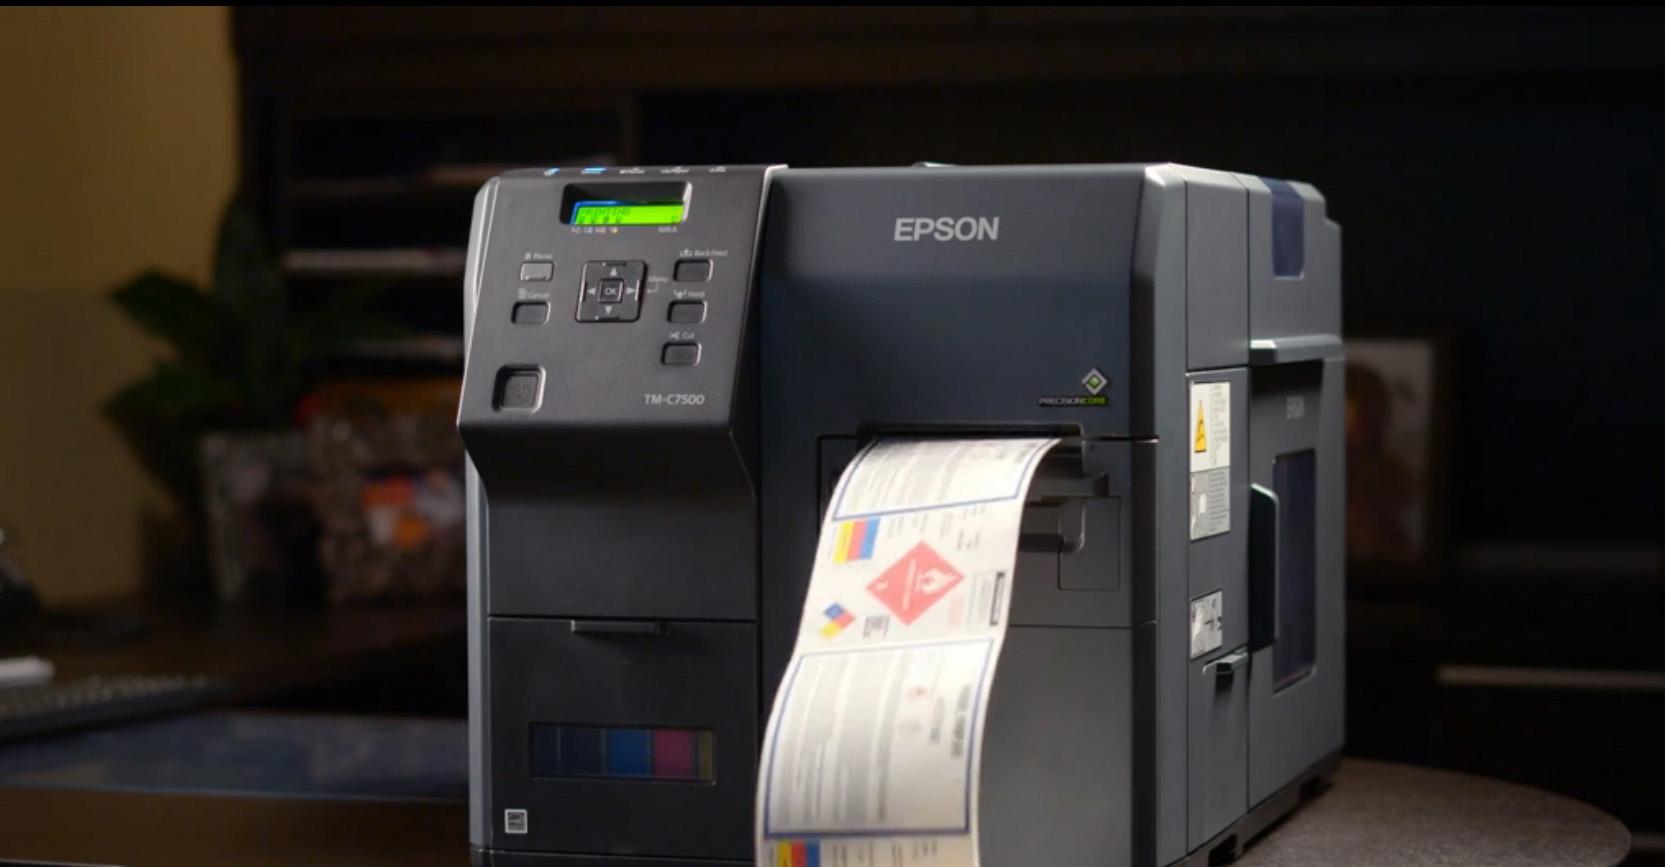 Smark Company ColorWorks C7500 Inkjet Label Printer